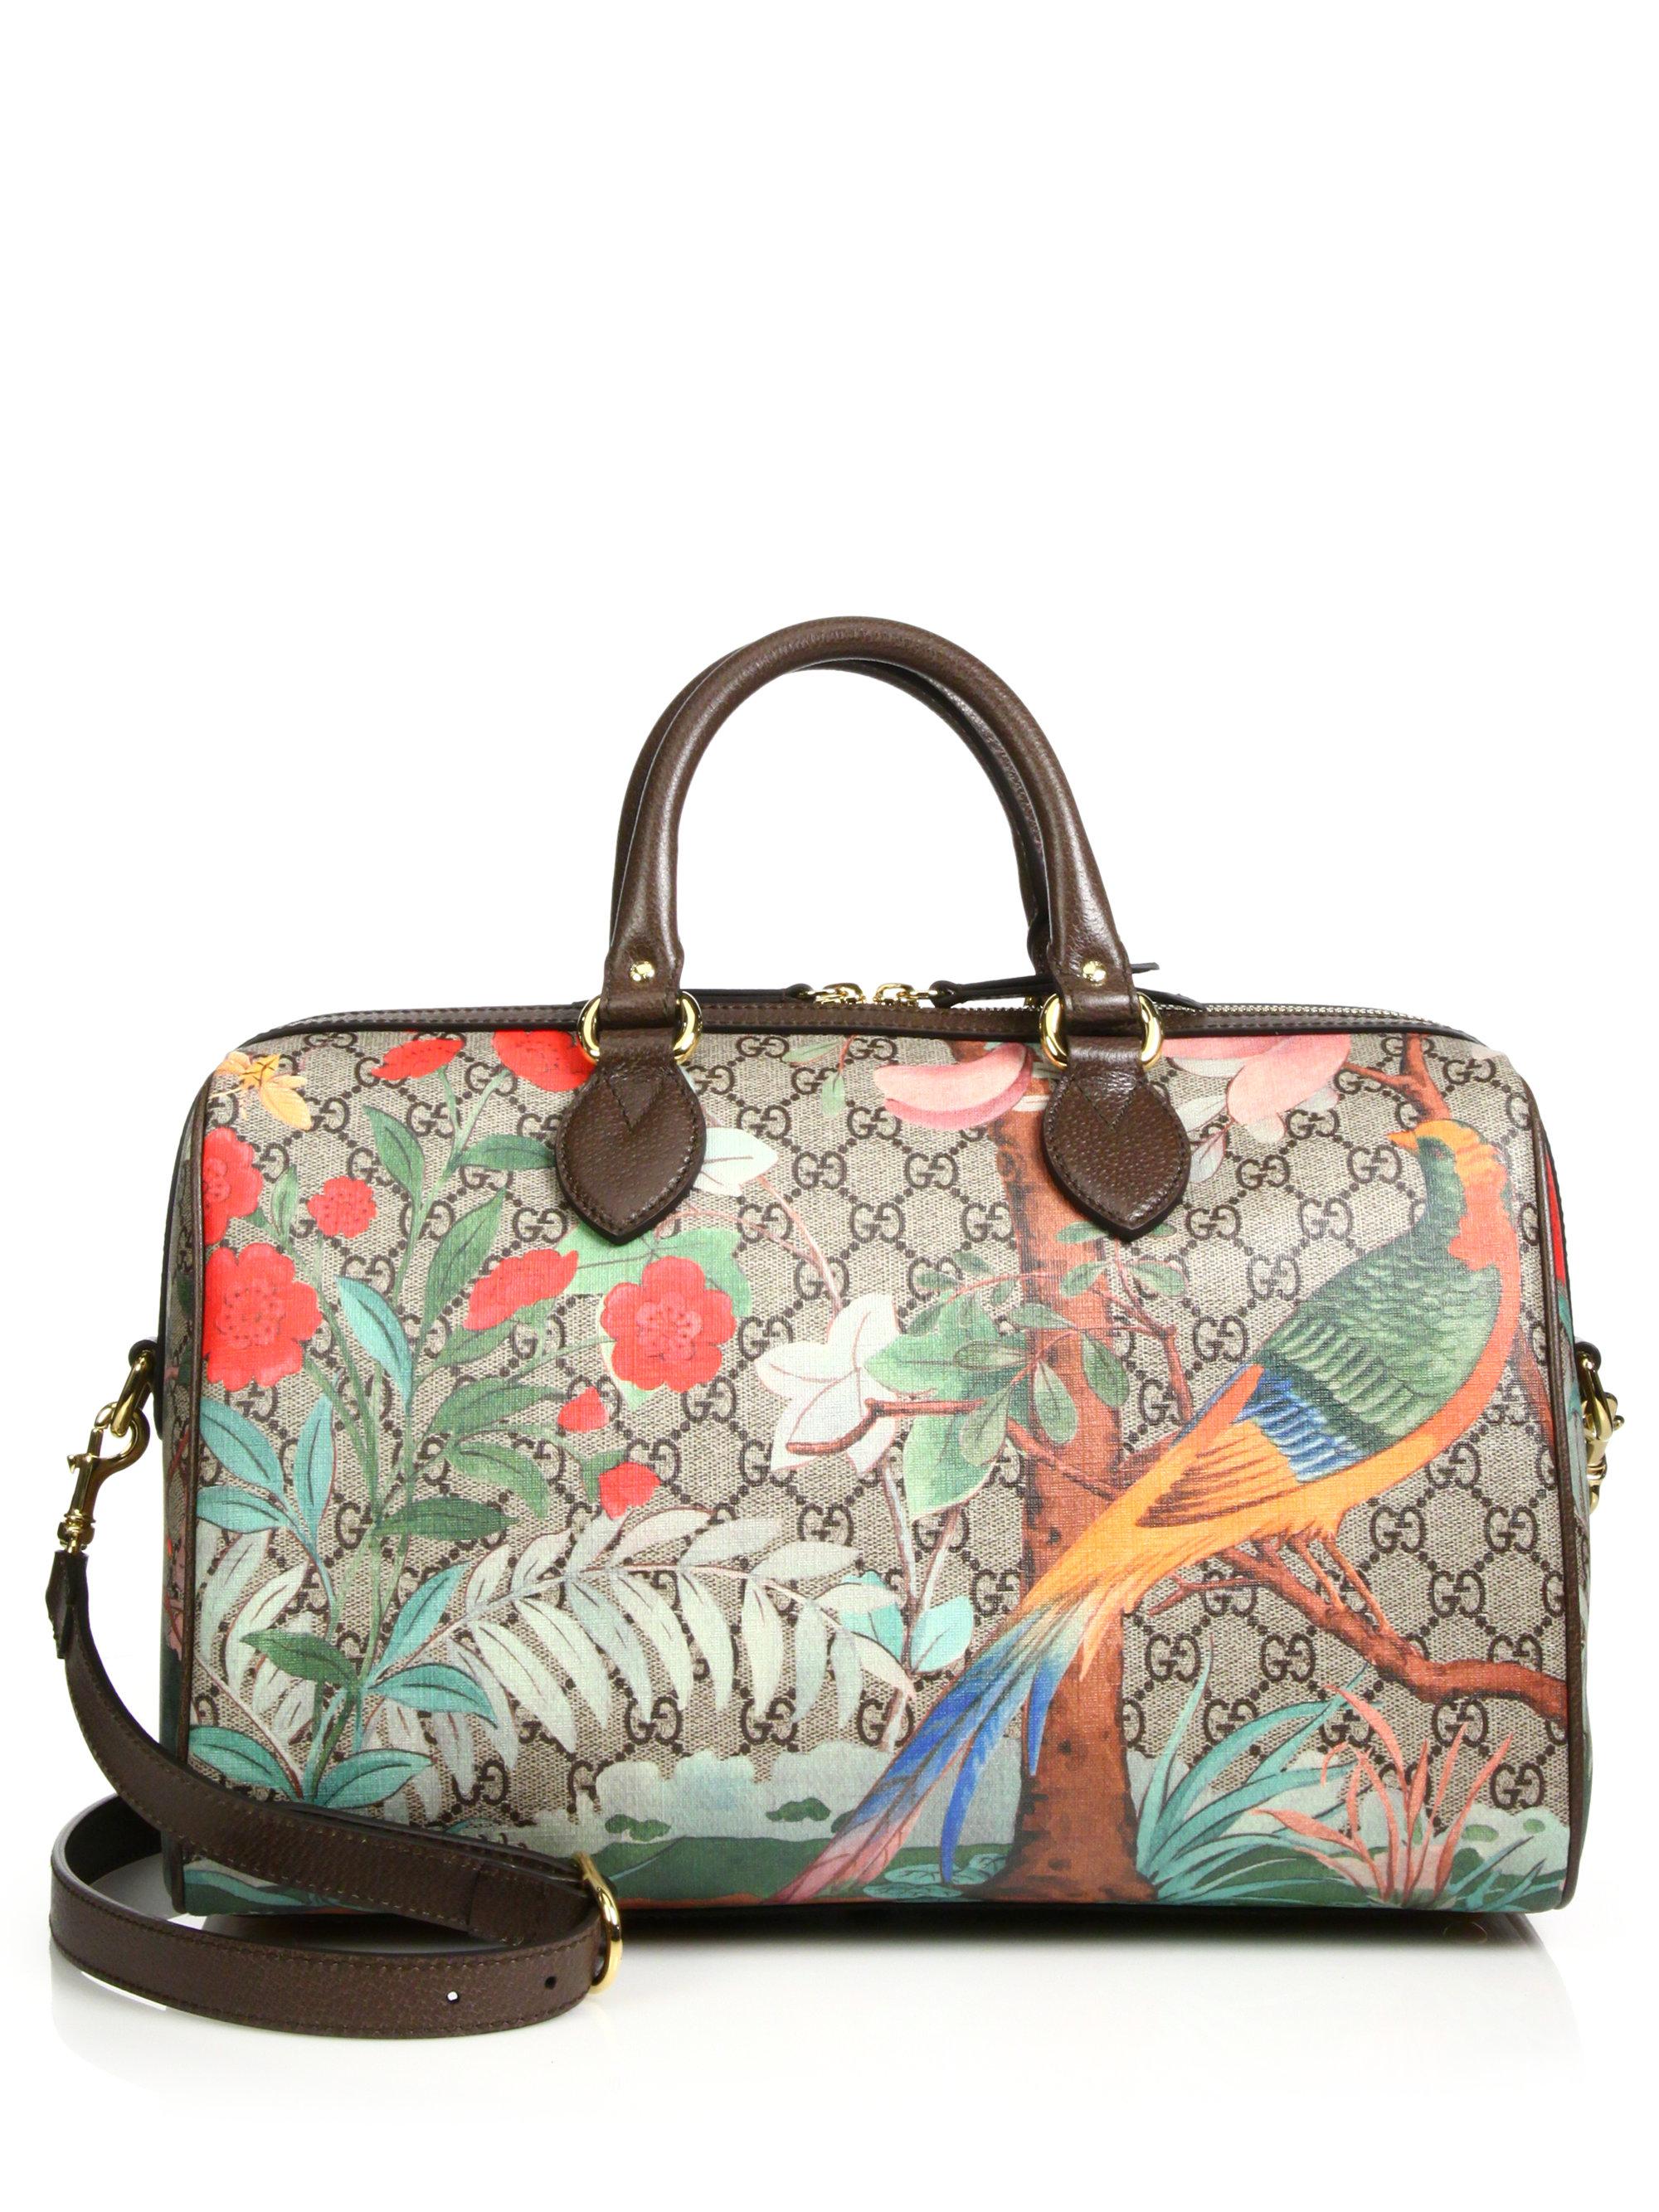 59618c3c4dfb1 Lyst - Gucci Tian Gg Supreme Top-handle Boston Bag